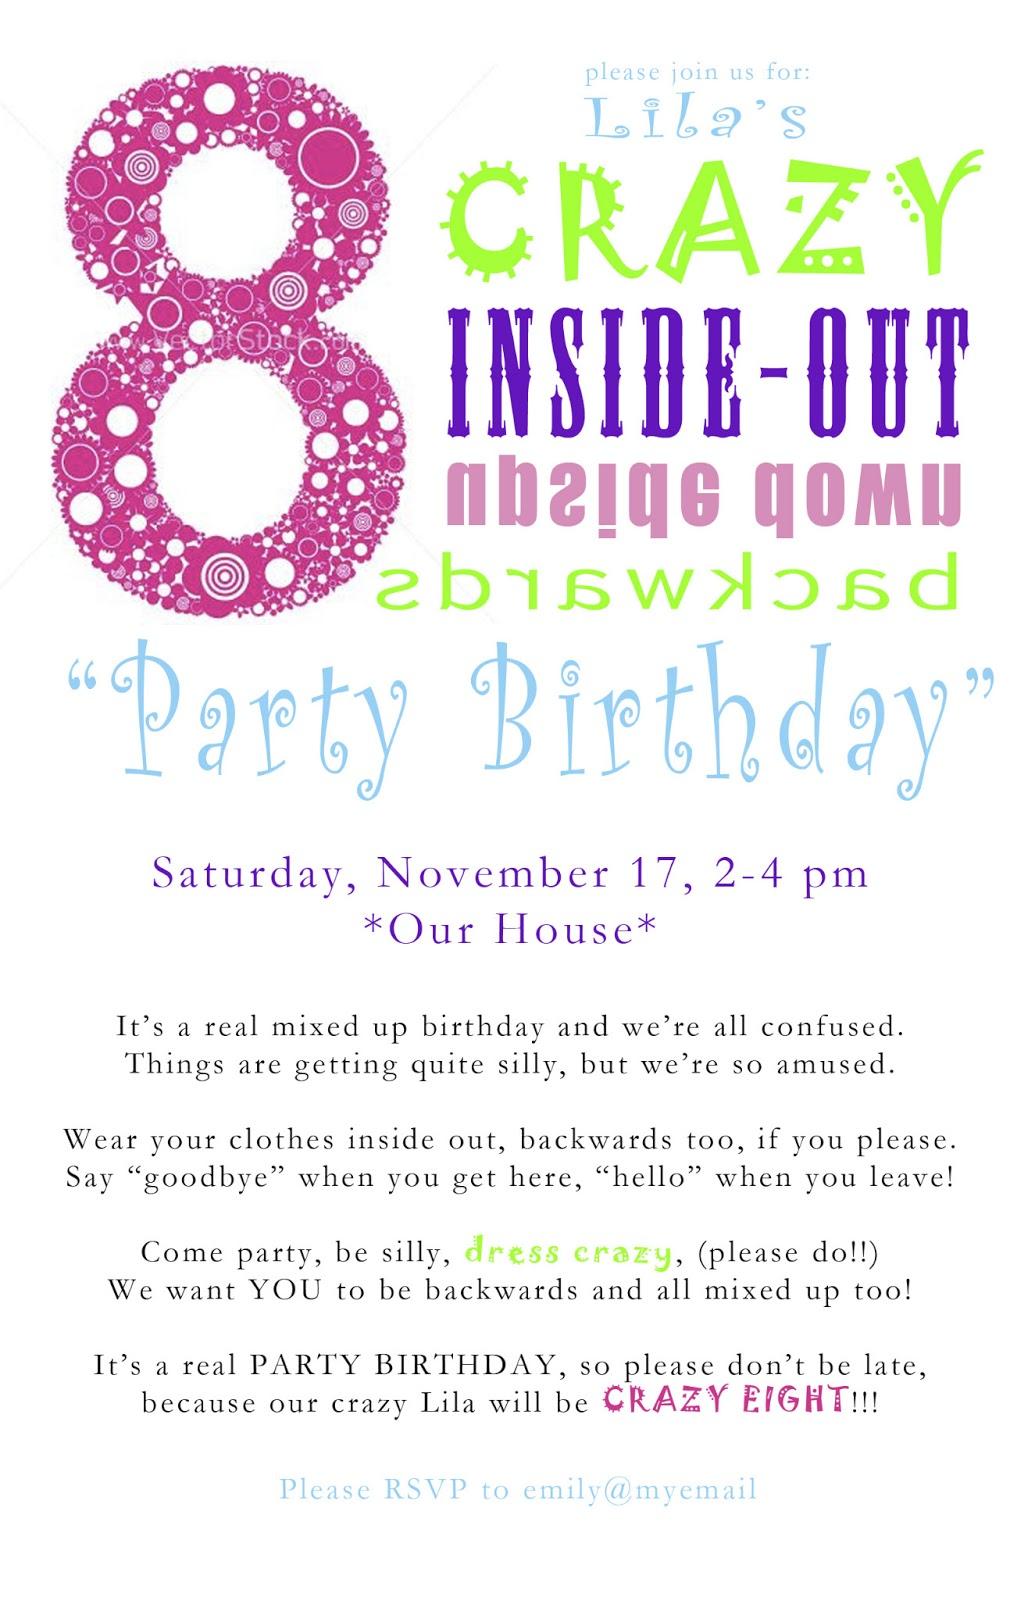 Crazy 8 Birthday Party